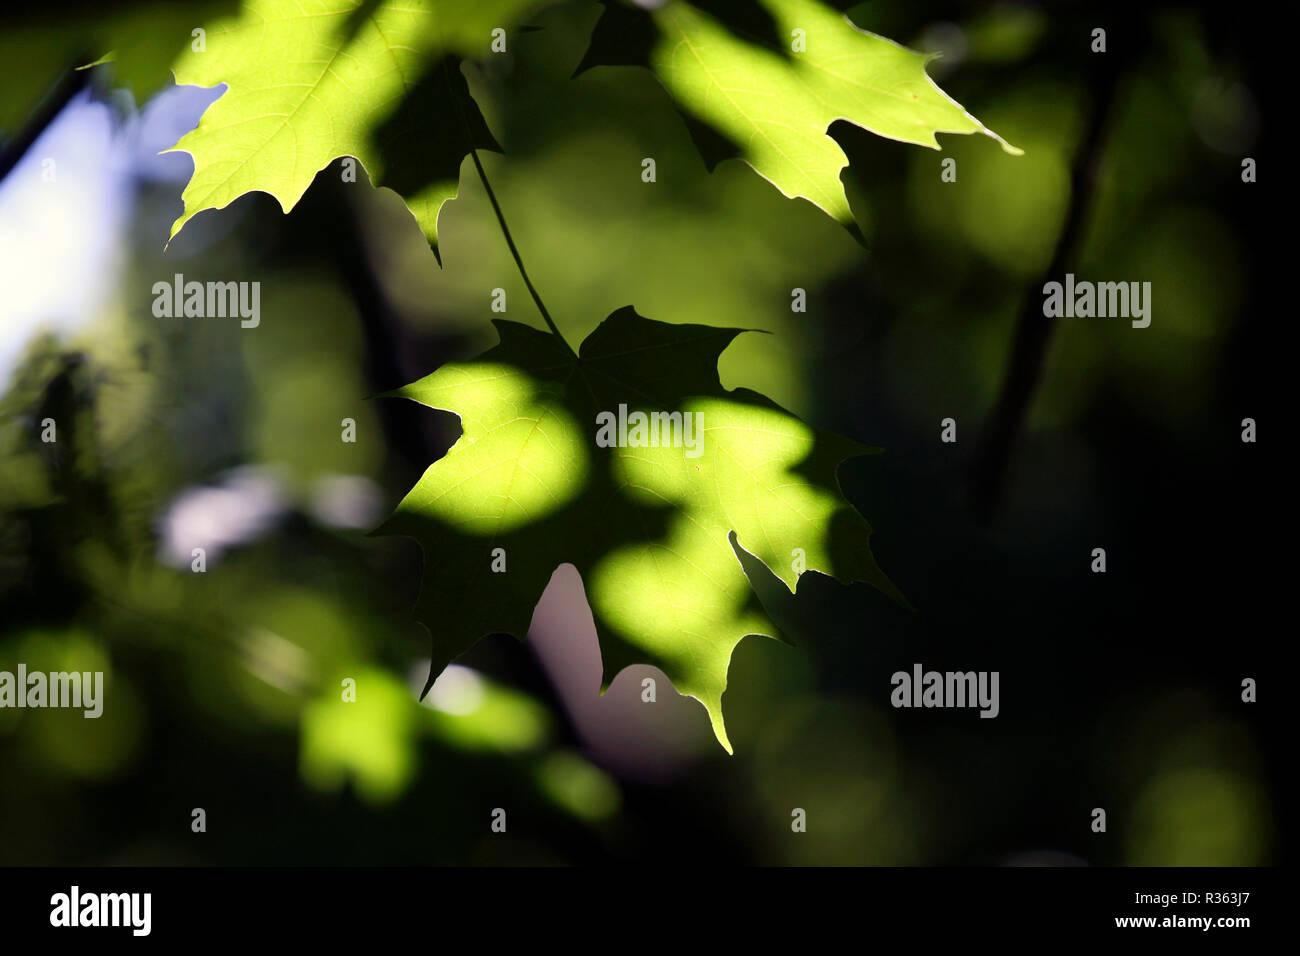 Sun dappled leaves, Inwood Hill Park, Manhattan New York City - Stock Image